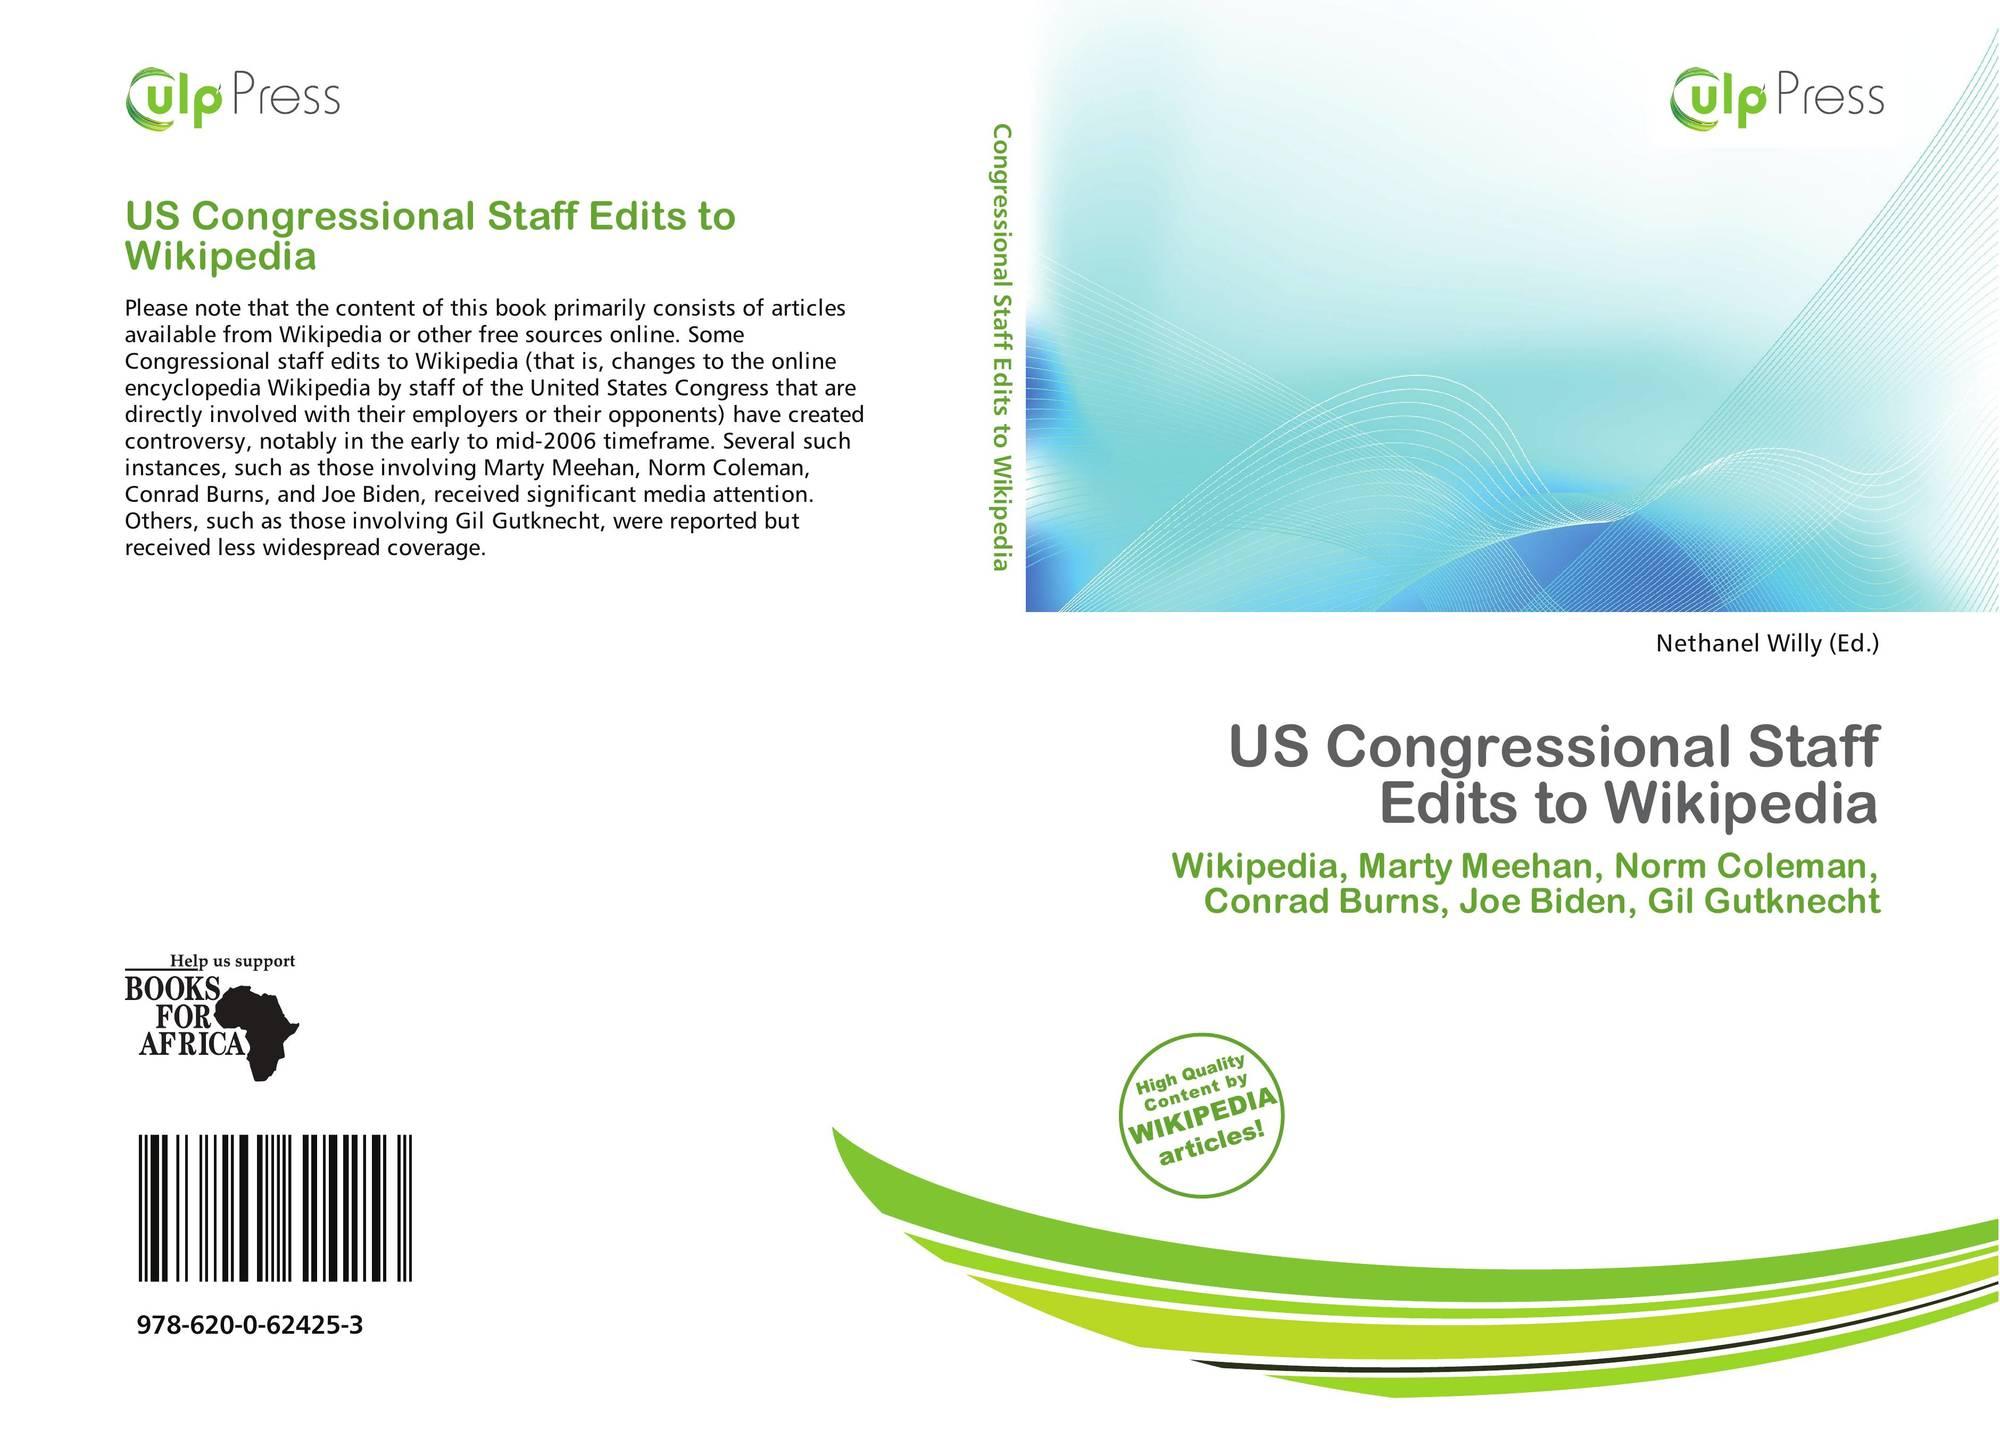 US Congressional Staff Edits to Wikipedia, 978-620-0-62425-3 ...